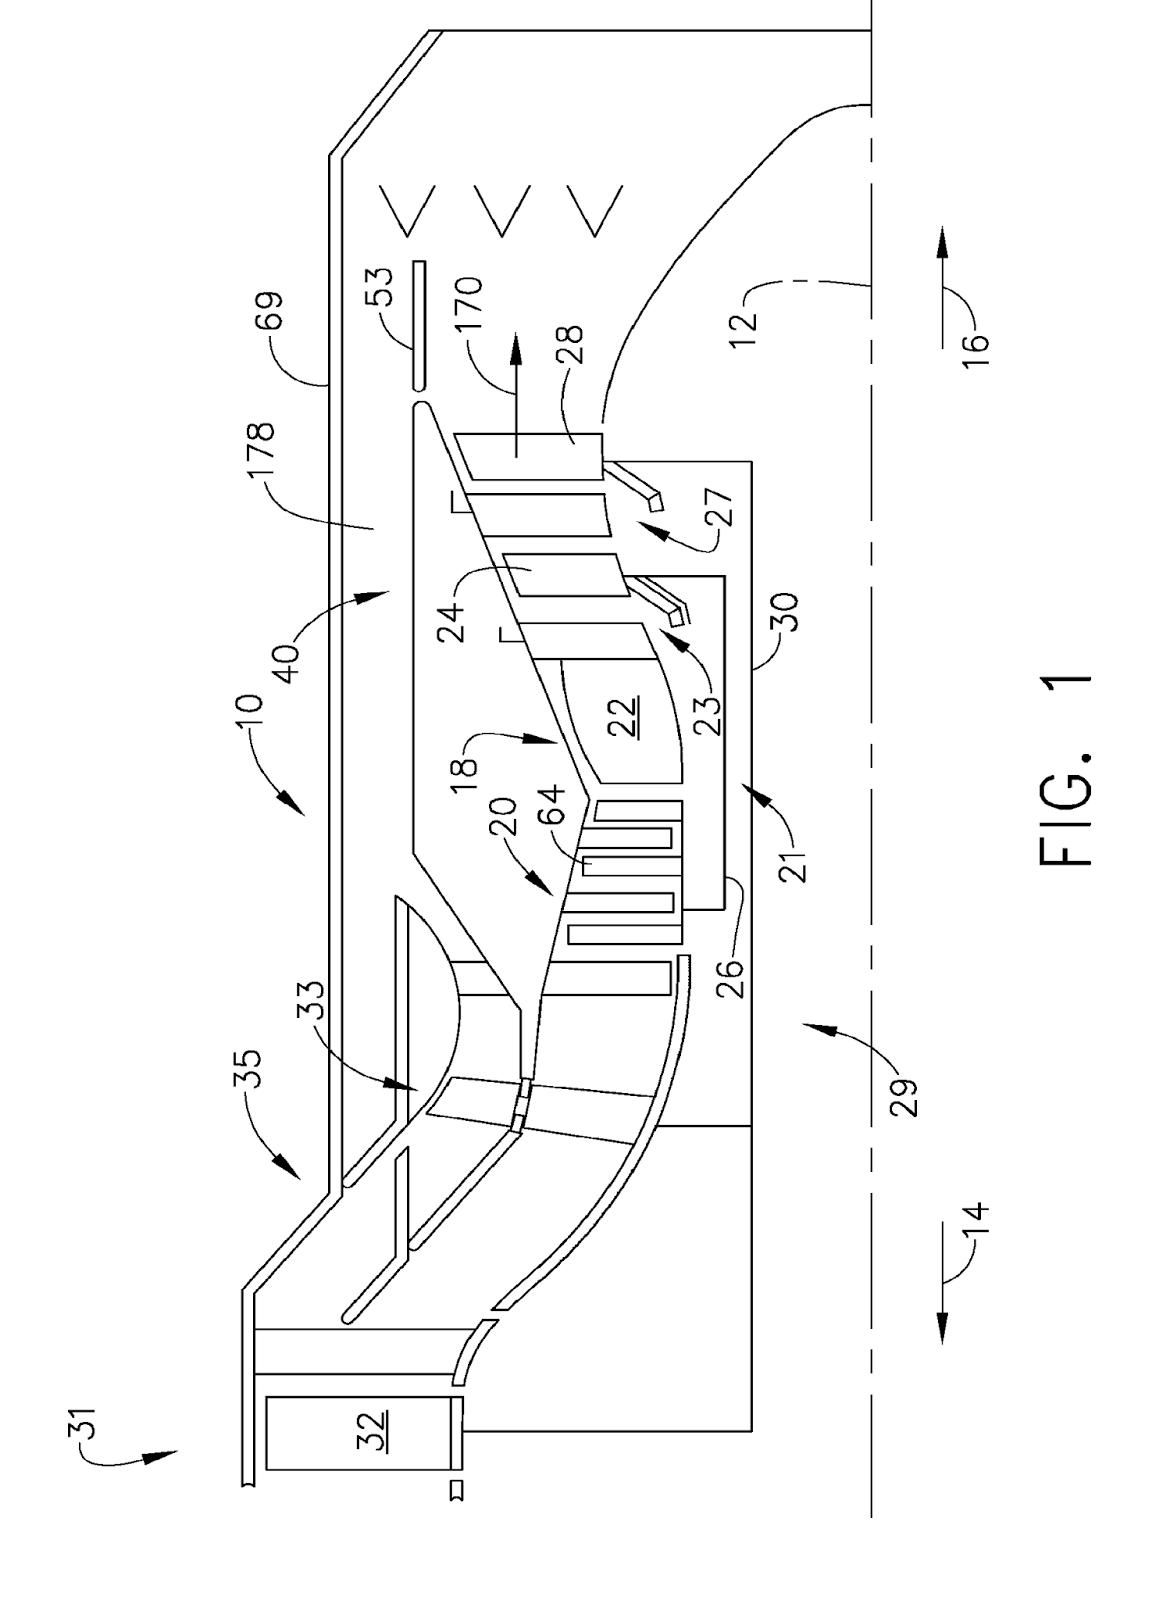 variable coupling of turbofan engine spools via open